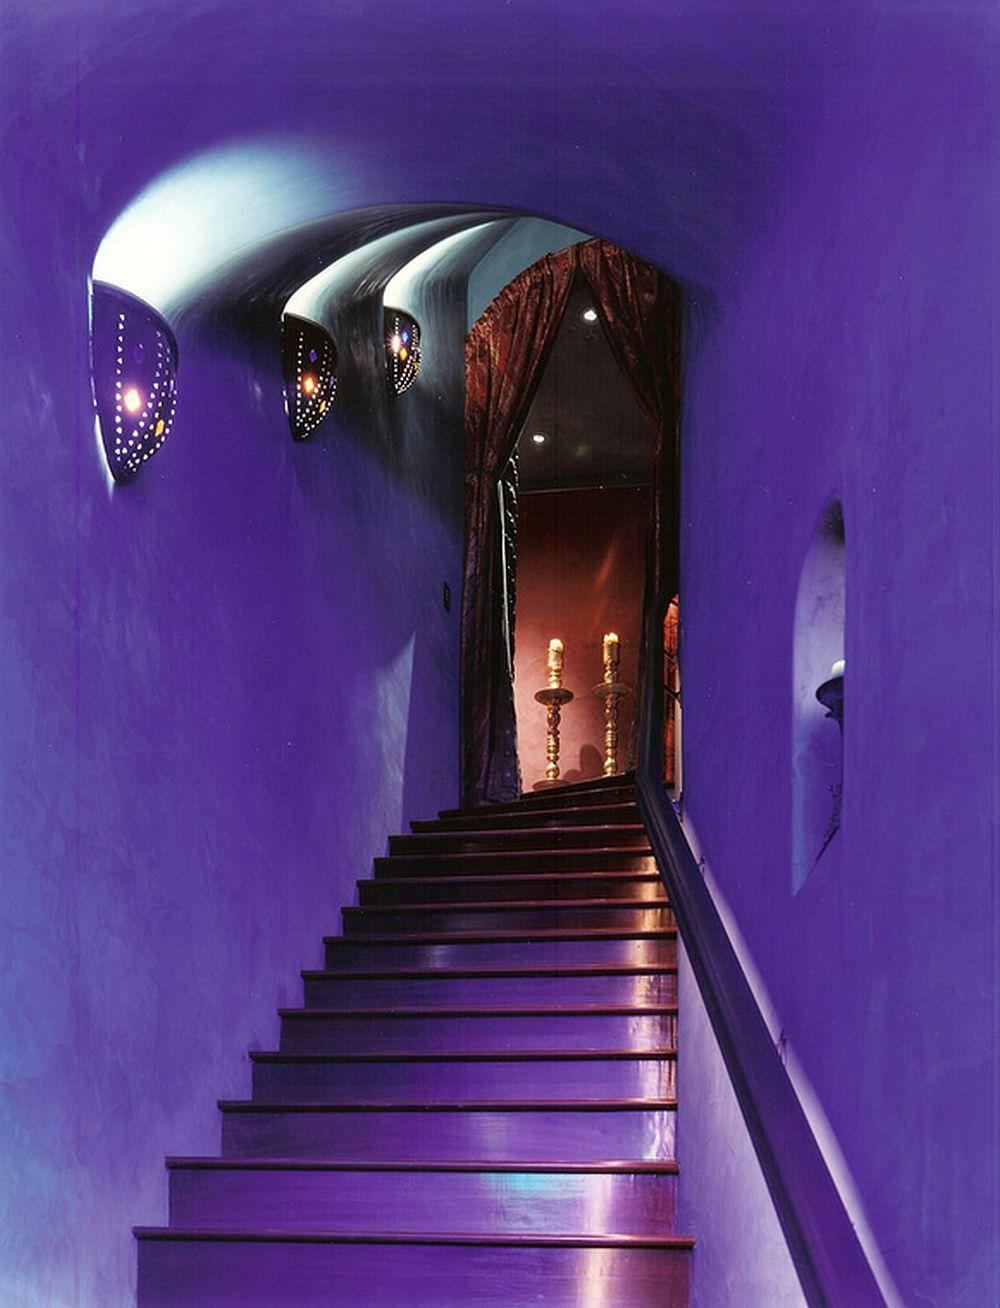 adelaparvu.com despre casa in stil marocan, maroccan kasbah, design interior Barry Johnson, arh Louie Leu, Foto Sharon Risedorph (9)